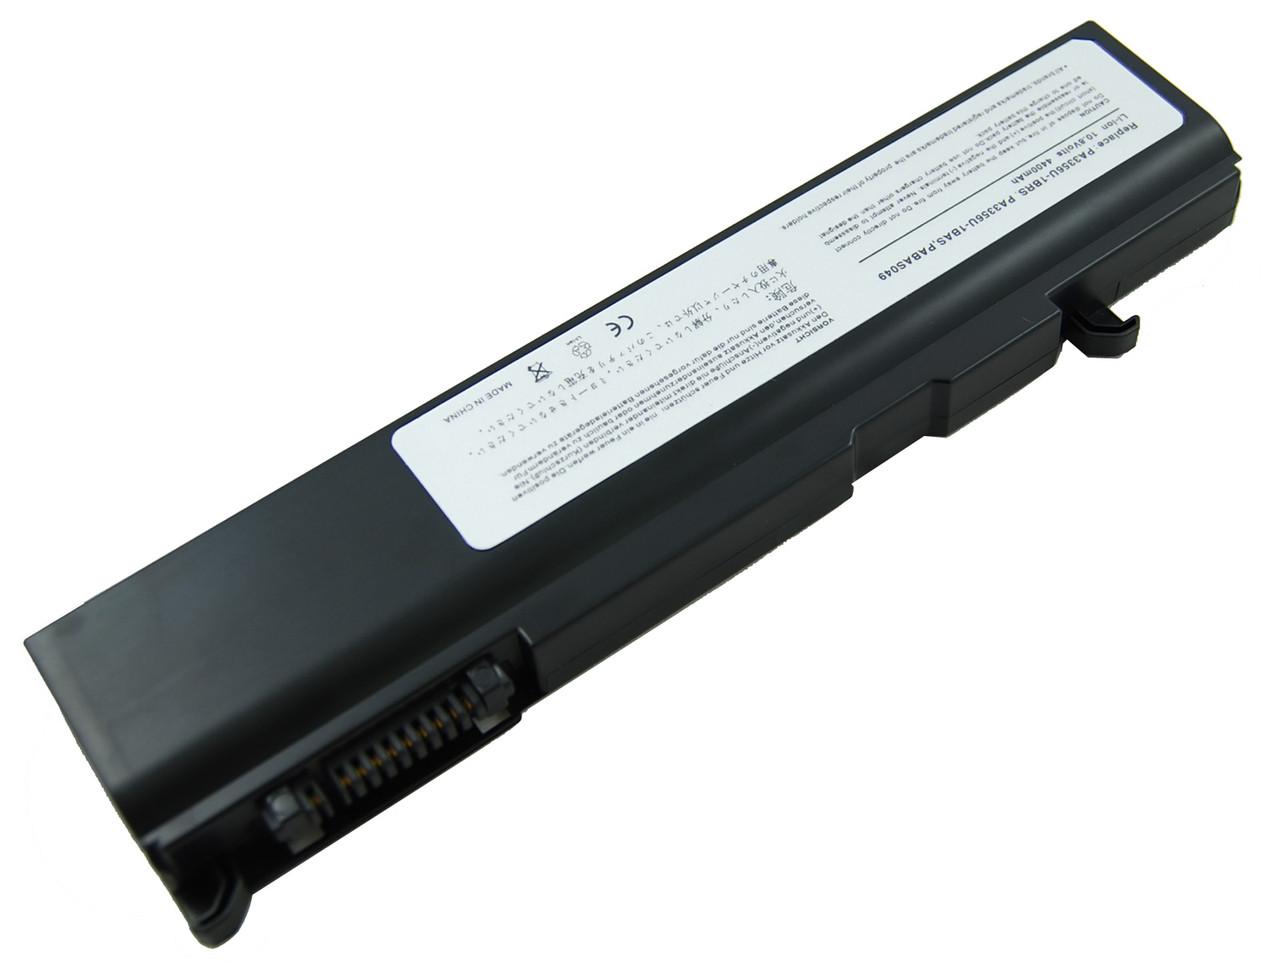 Аккумулятор для ноутбука Toshiba PA3357U-1BRL